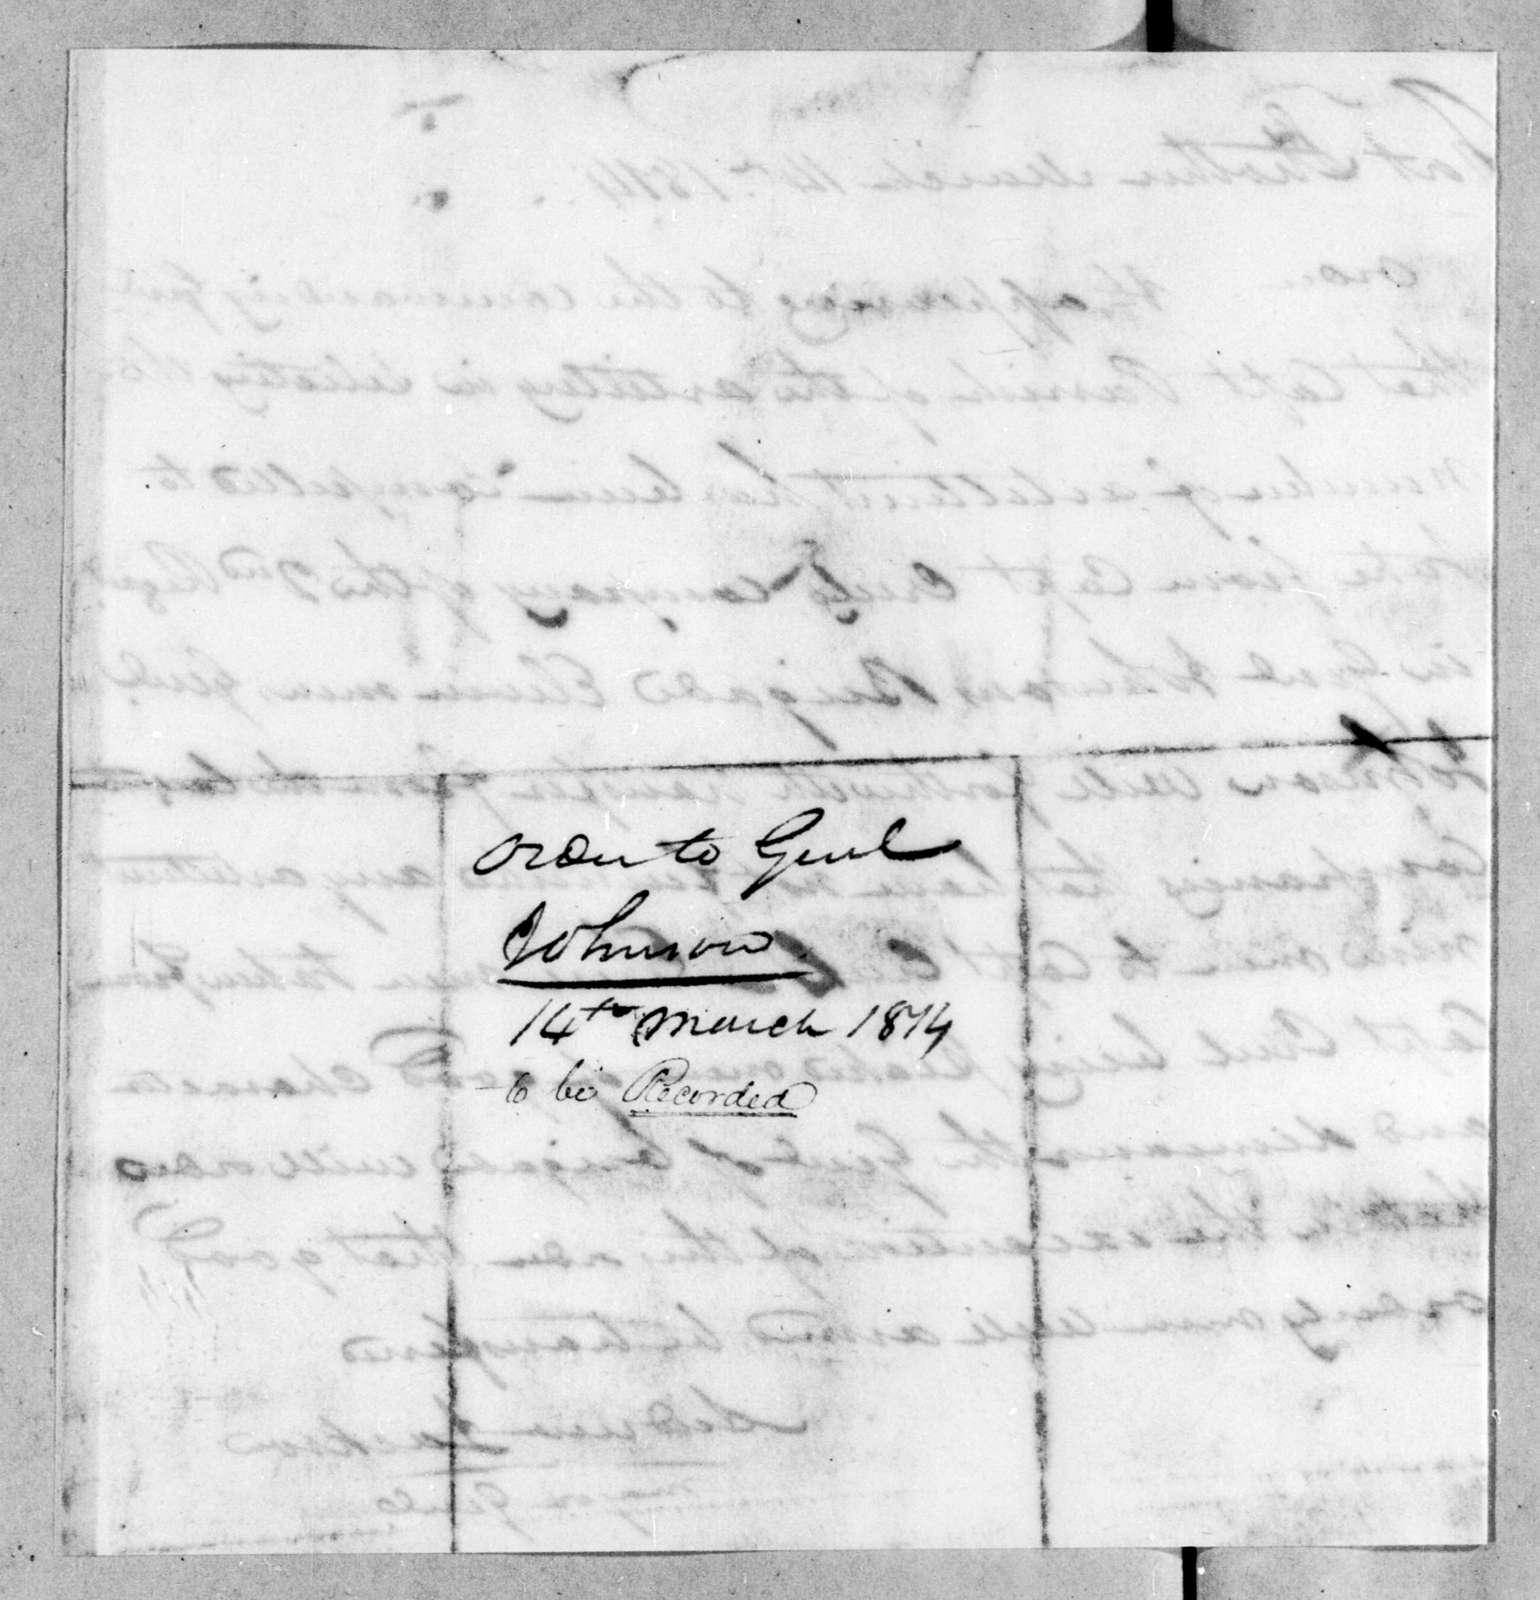 Andrew Jackson, March 14, 1814